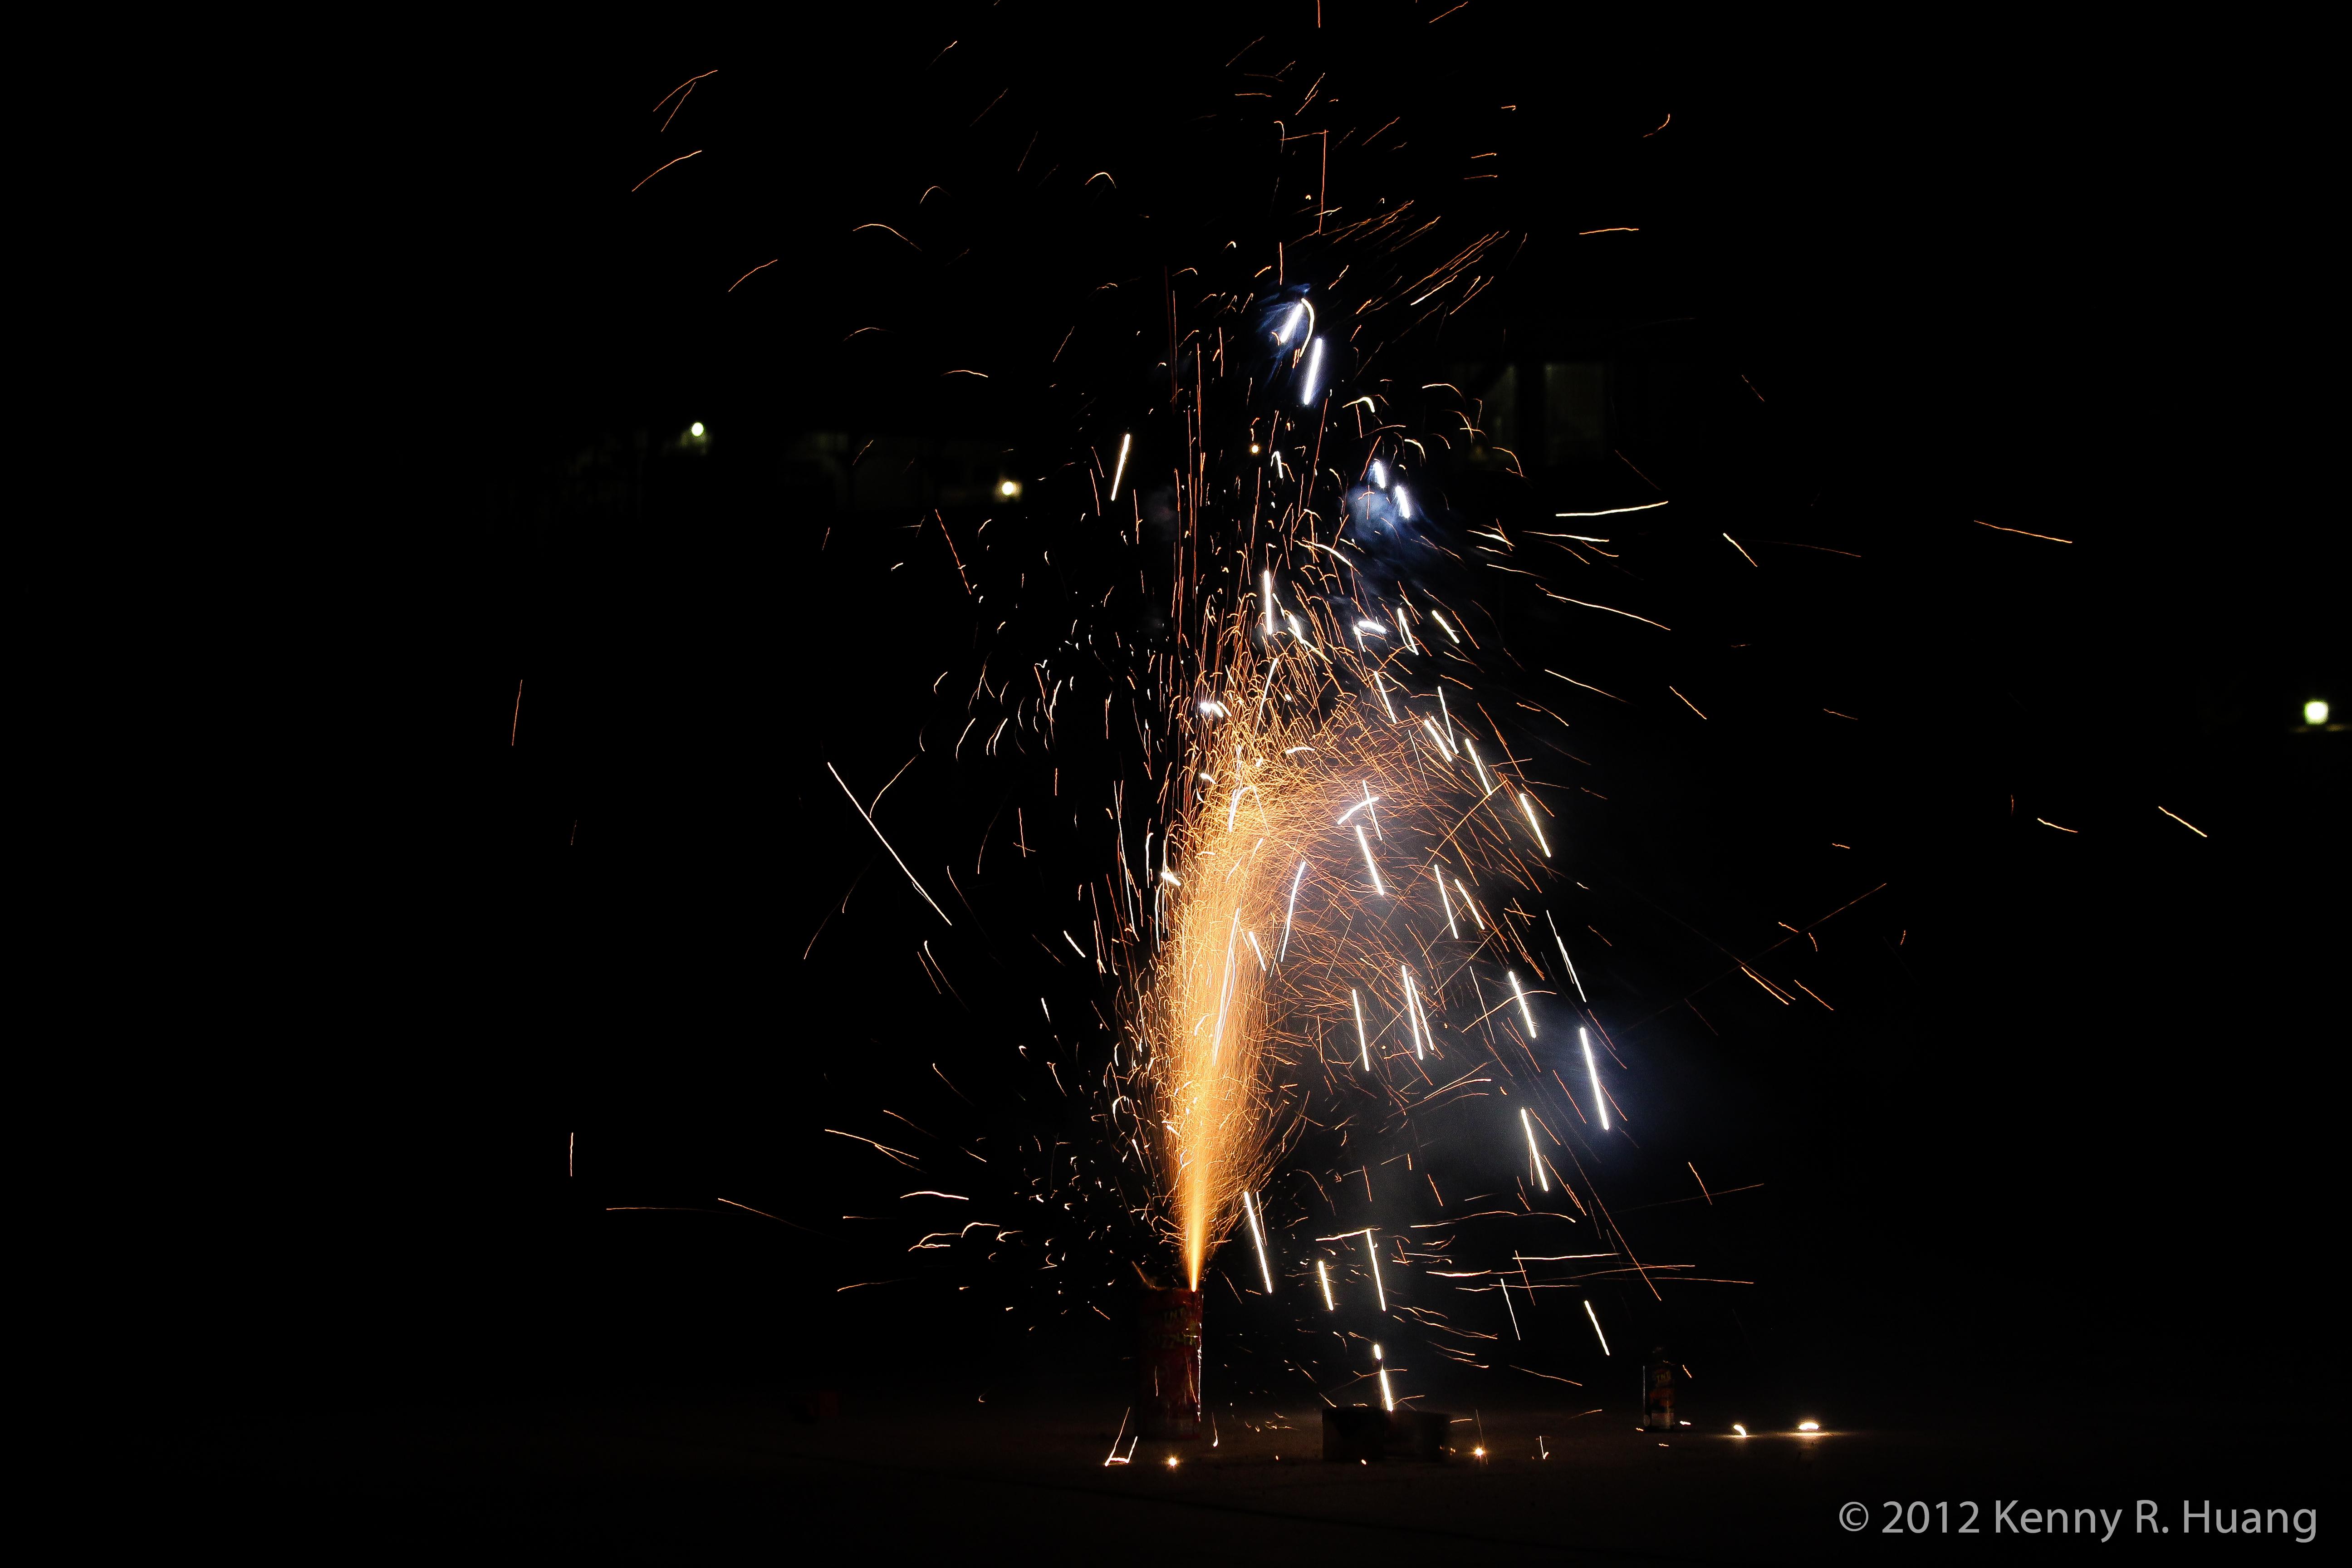 2012-kenny-r-huang-8609